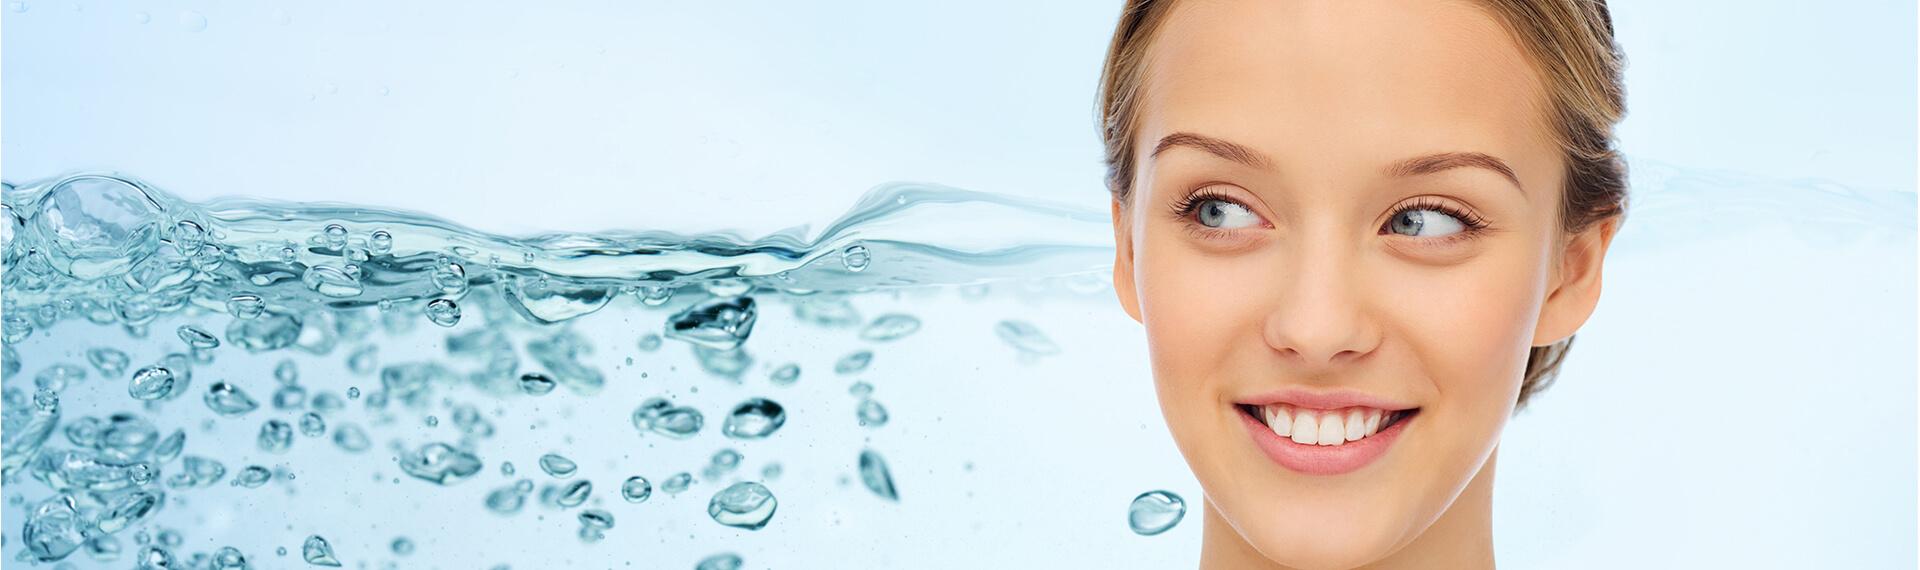 Walnut Scrub Benefits by Everyuth Naturals